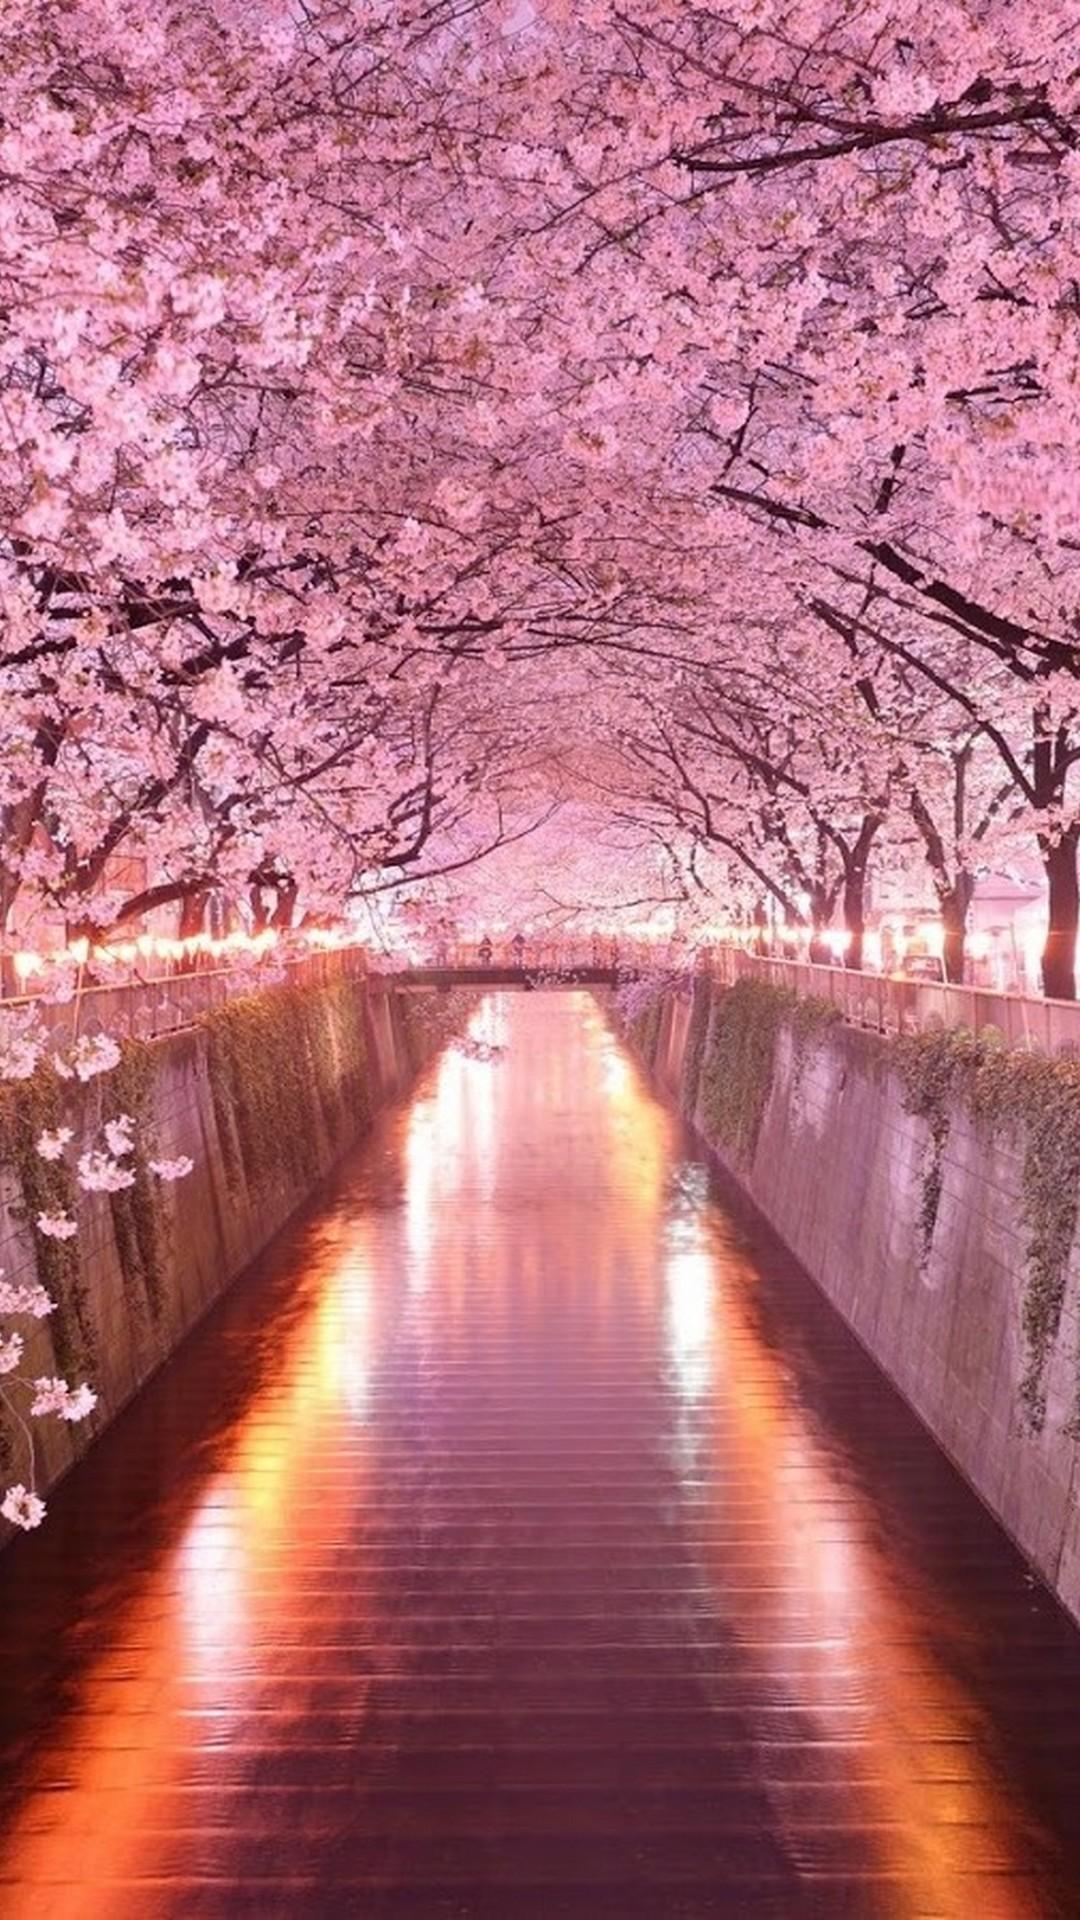 Pink Flower Iphone Wallpaper Hd 2020 Cute Wallpapers